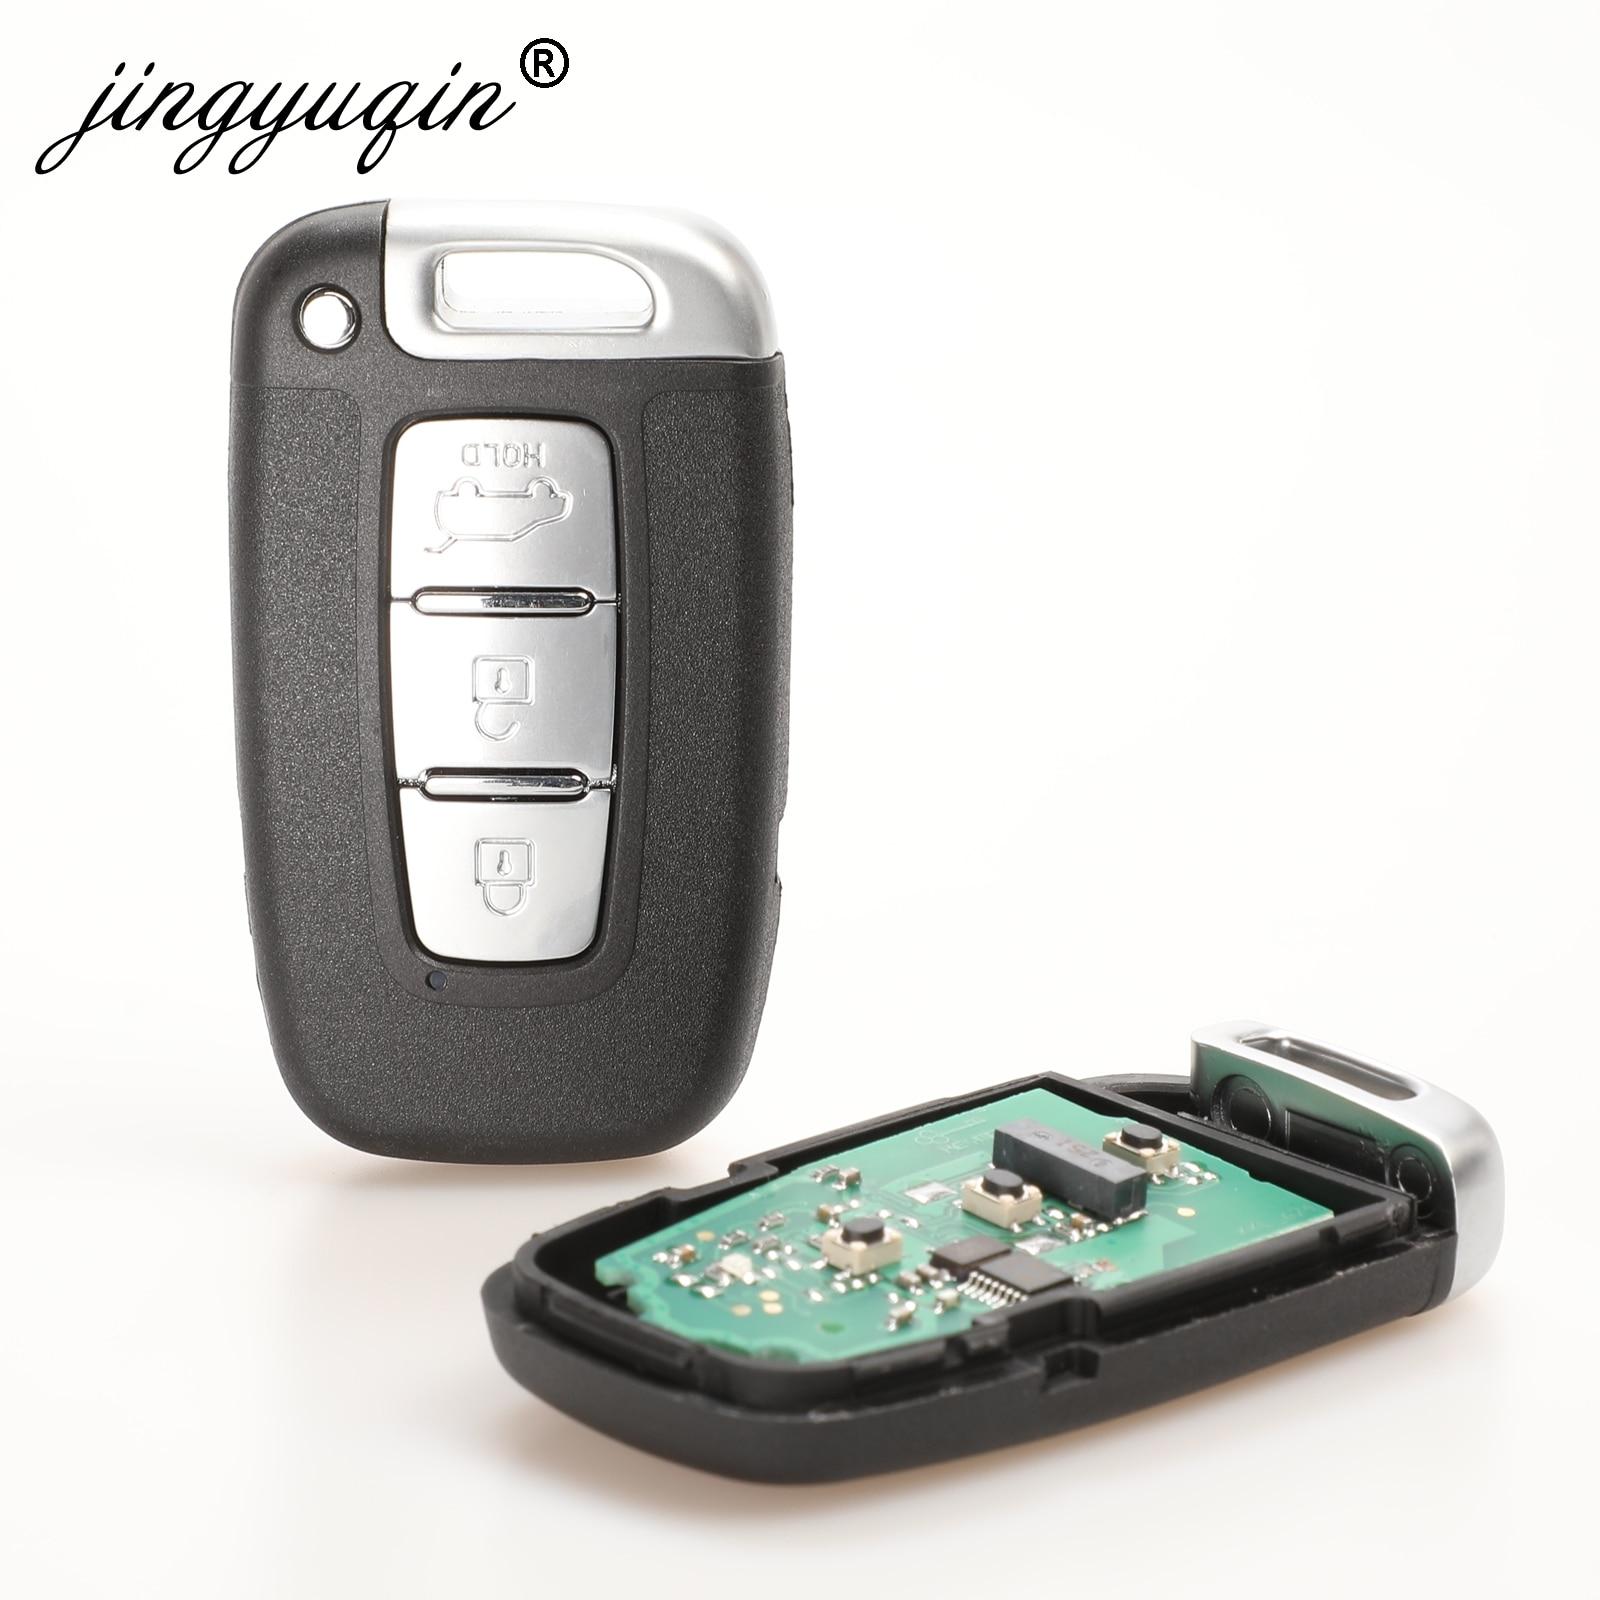 Bilchave Автомобильный Дистанционный умный ключ подходит для KIA 433MHz KIA Soul Sportage Sorento Mohave K2 K5 Rio Optima Forte Cerato с чипом